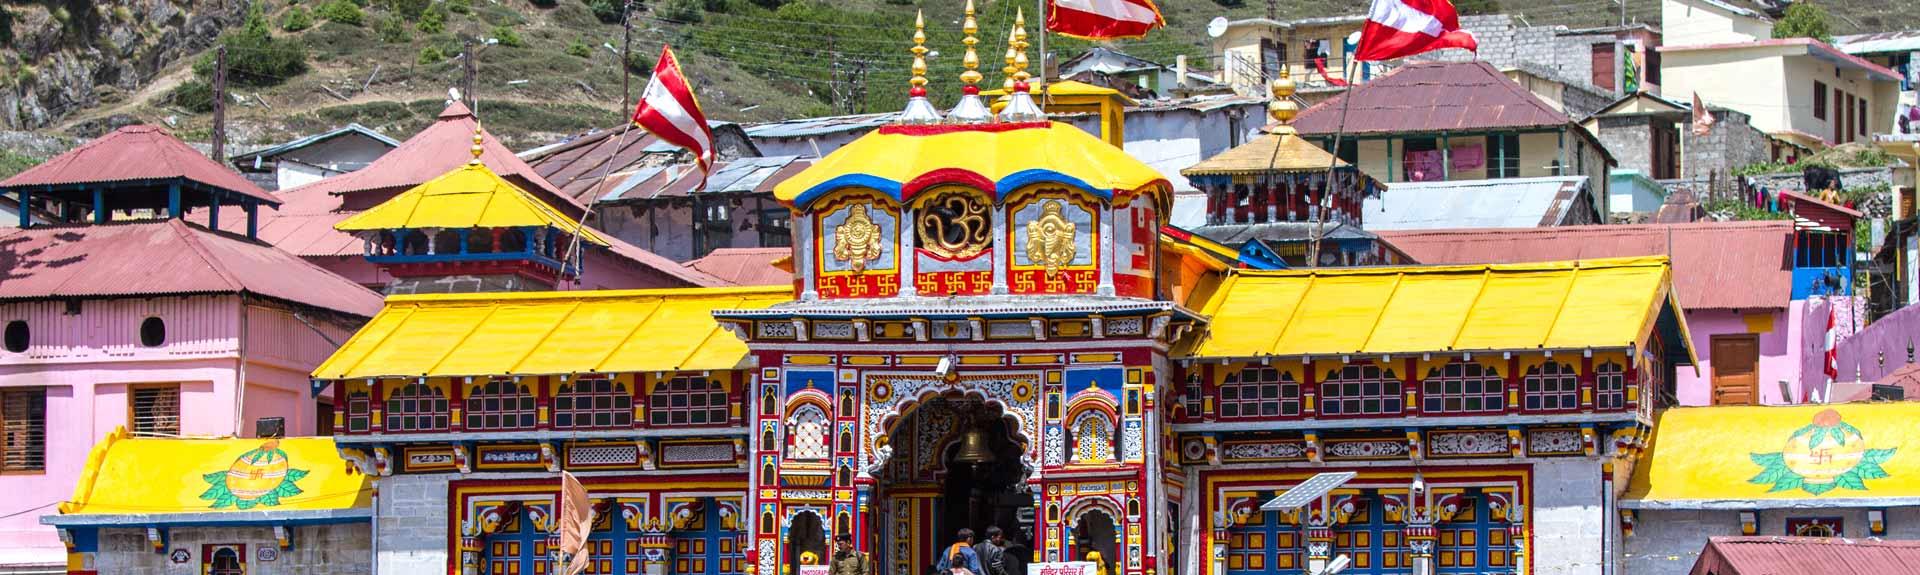 Gangotri and Yamunotri Yatra Package